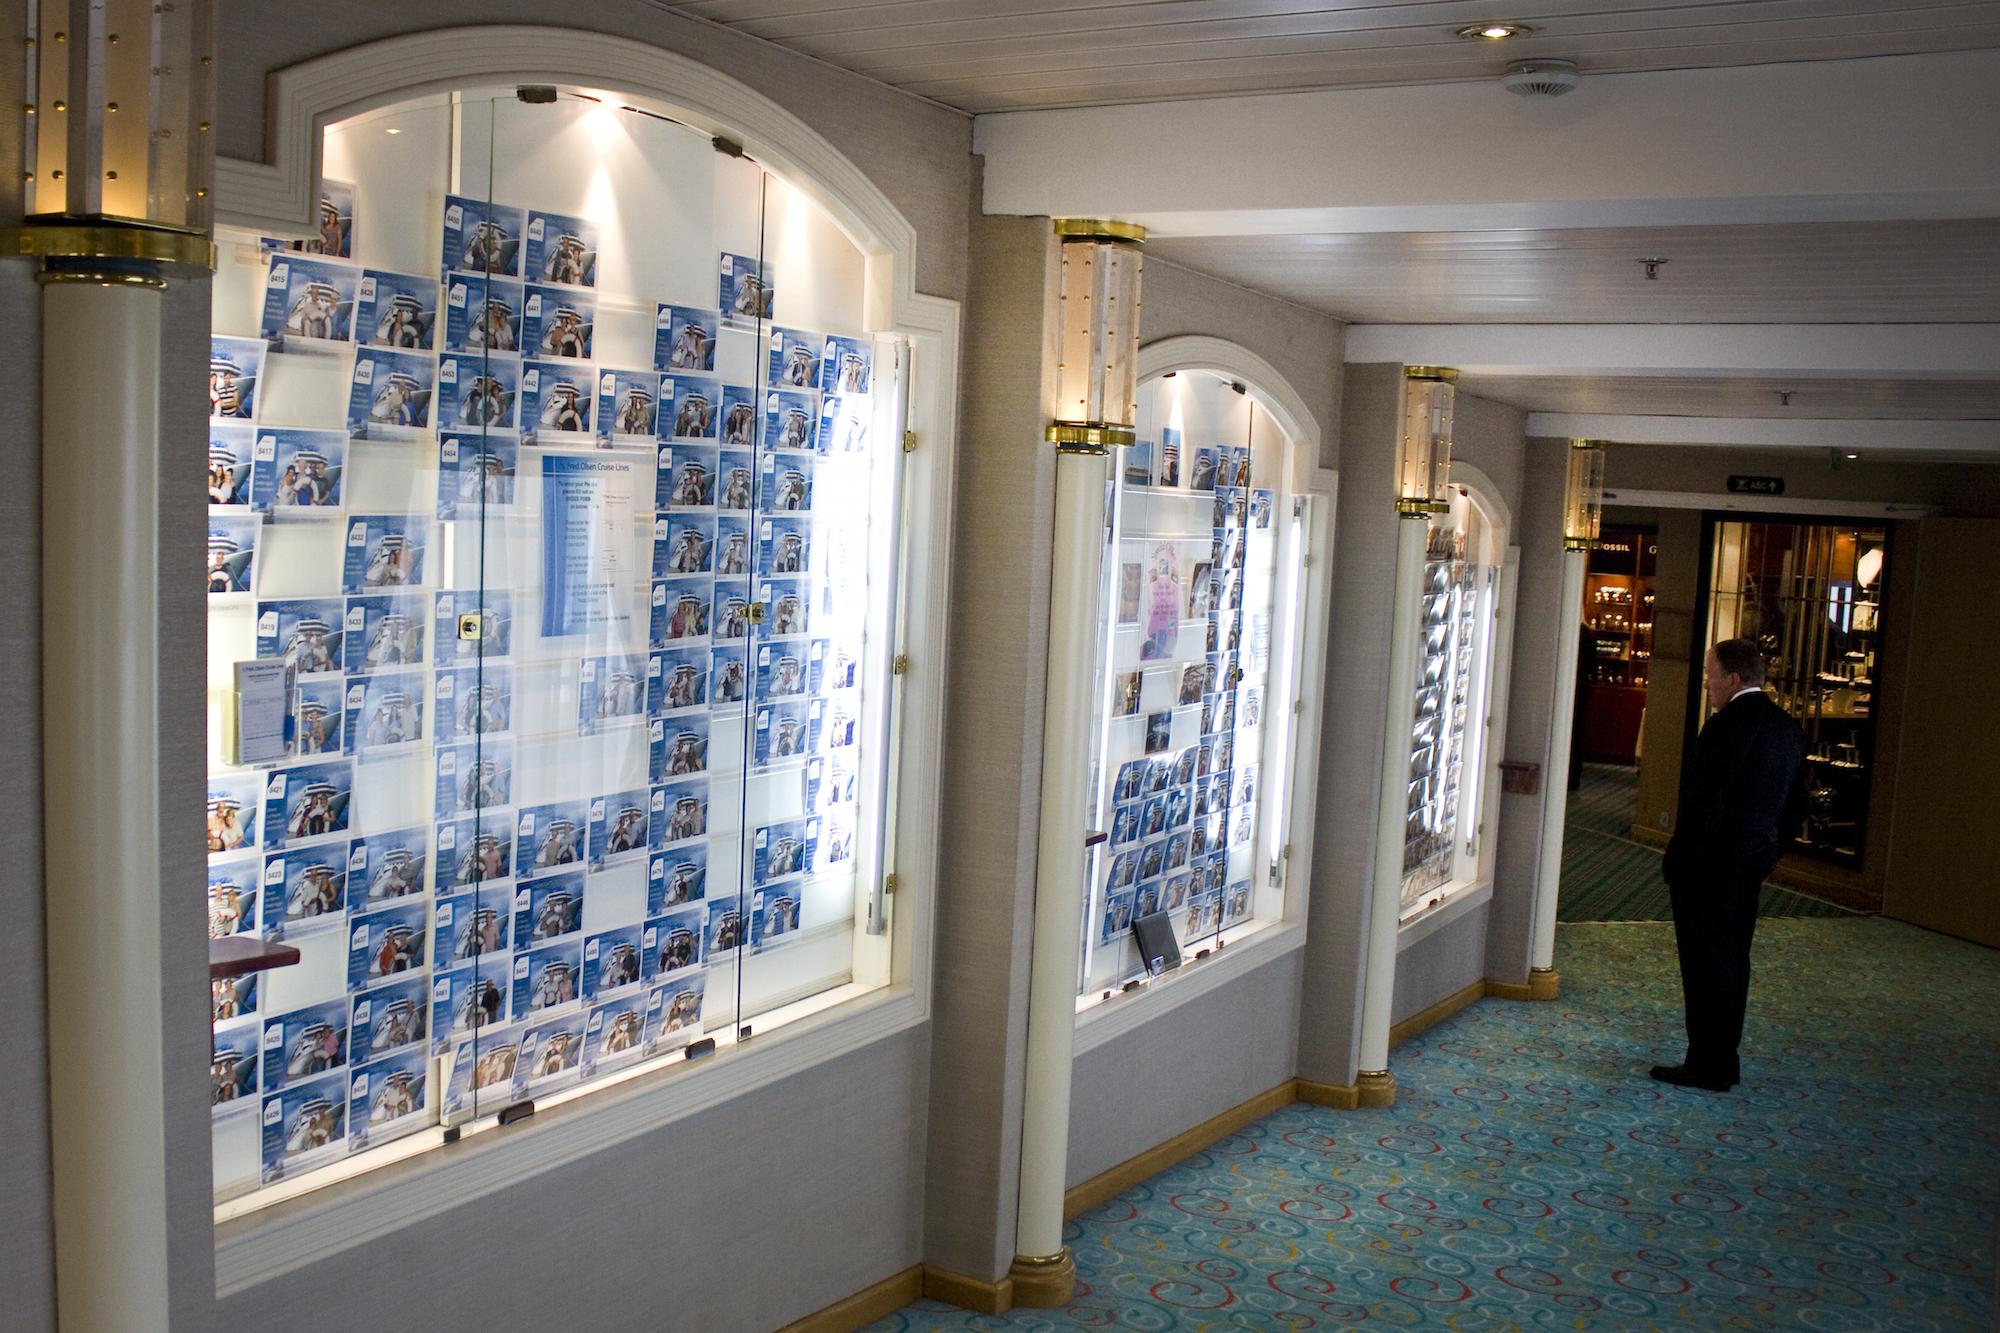 Fred Olsen Cruise Lines Braemar Interior Photo Gallery 2.jpg